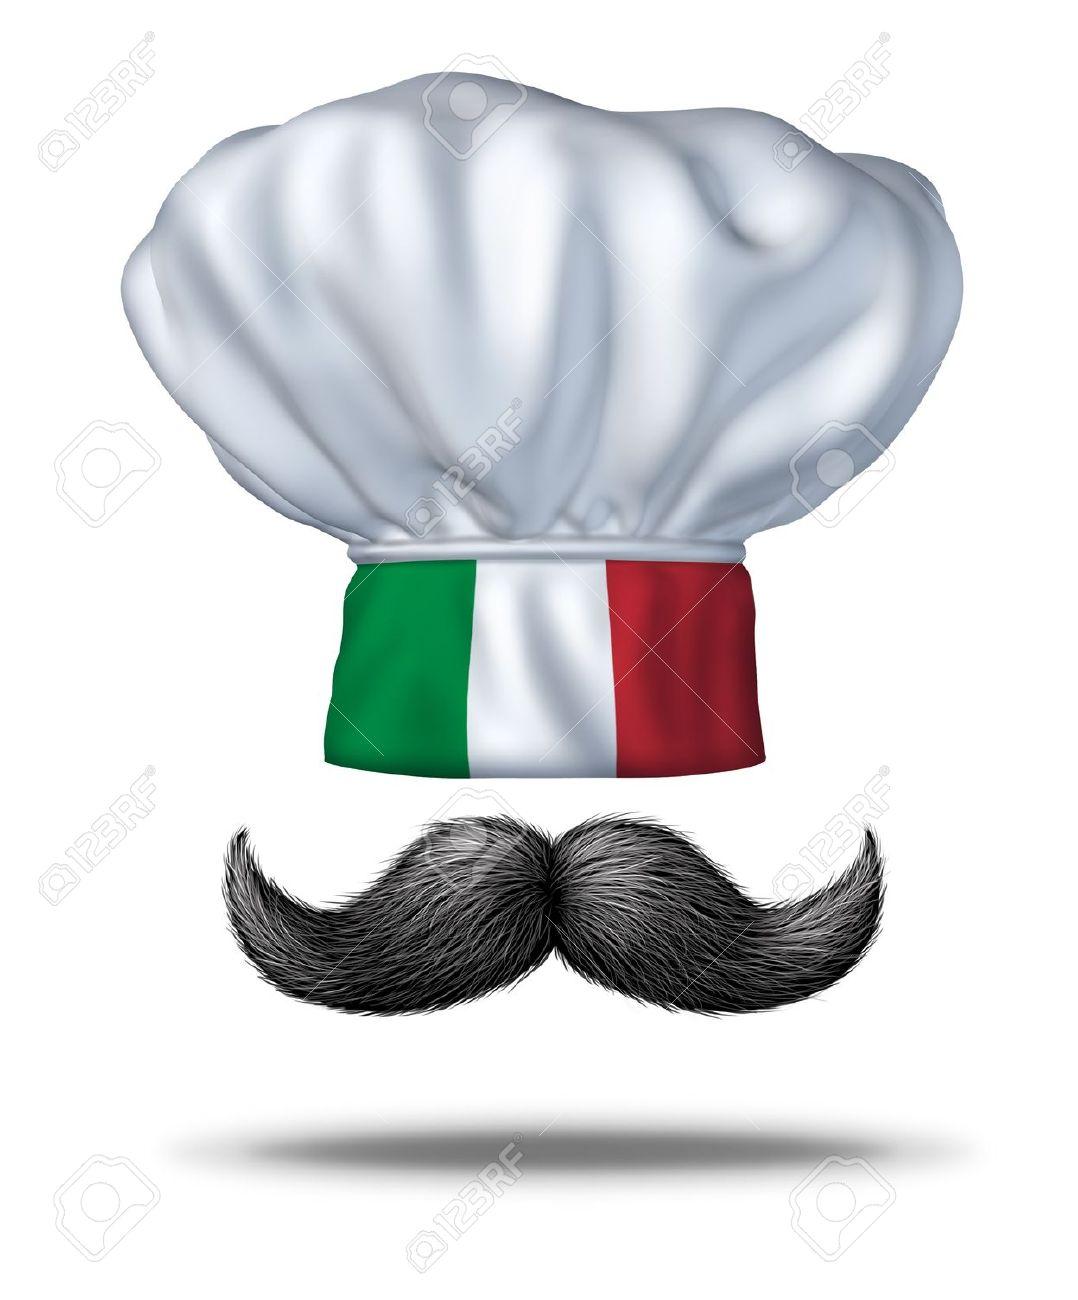 Hotel clipart italian food #14